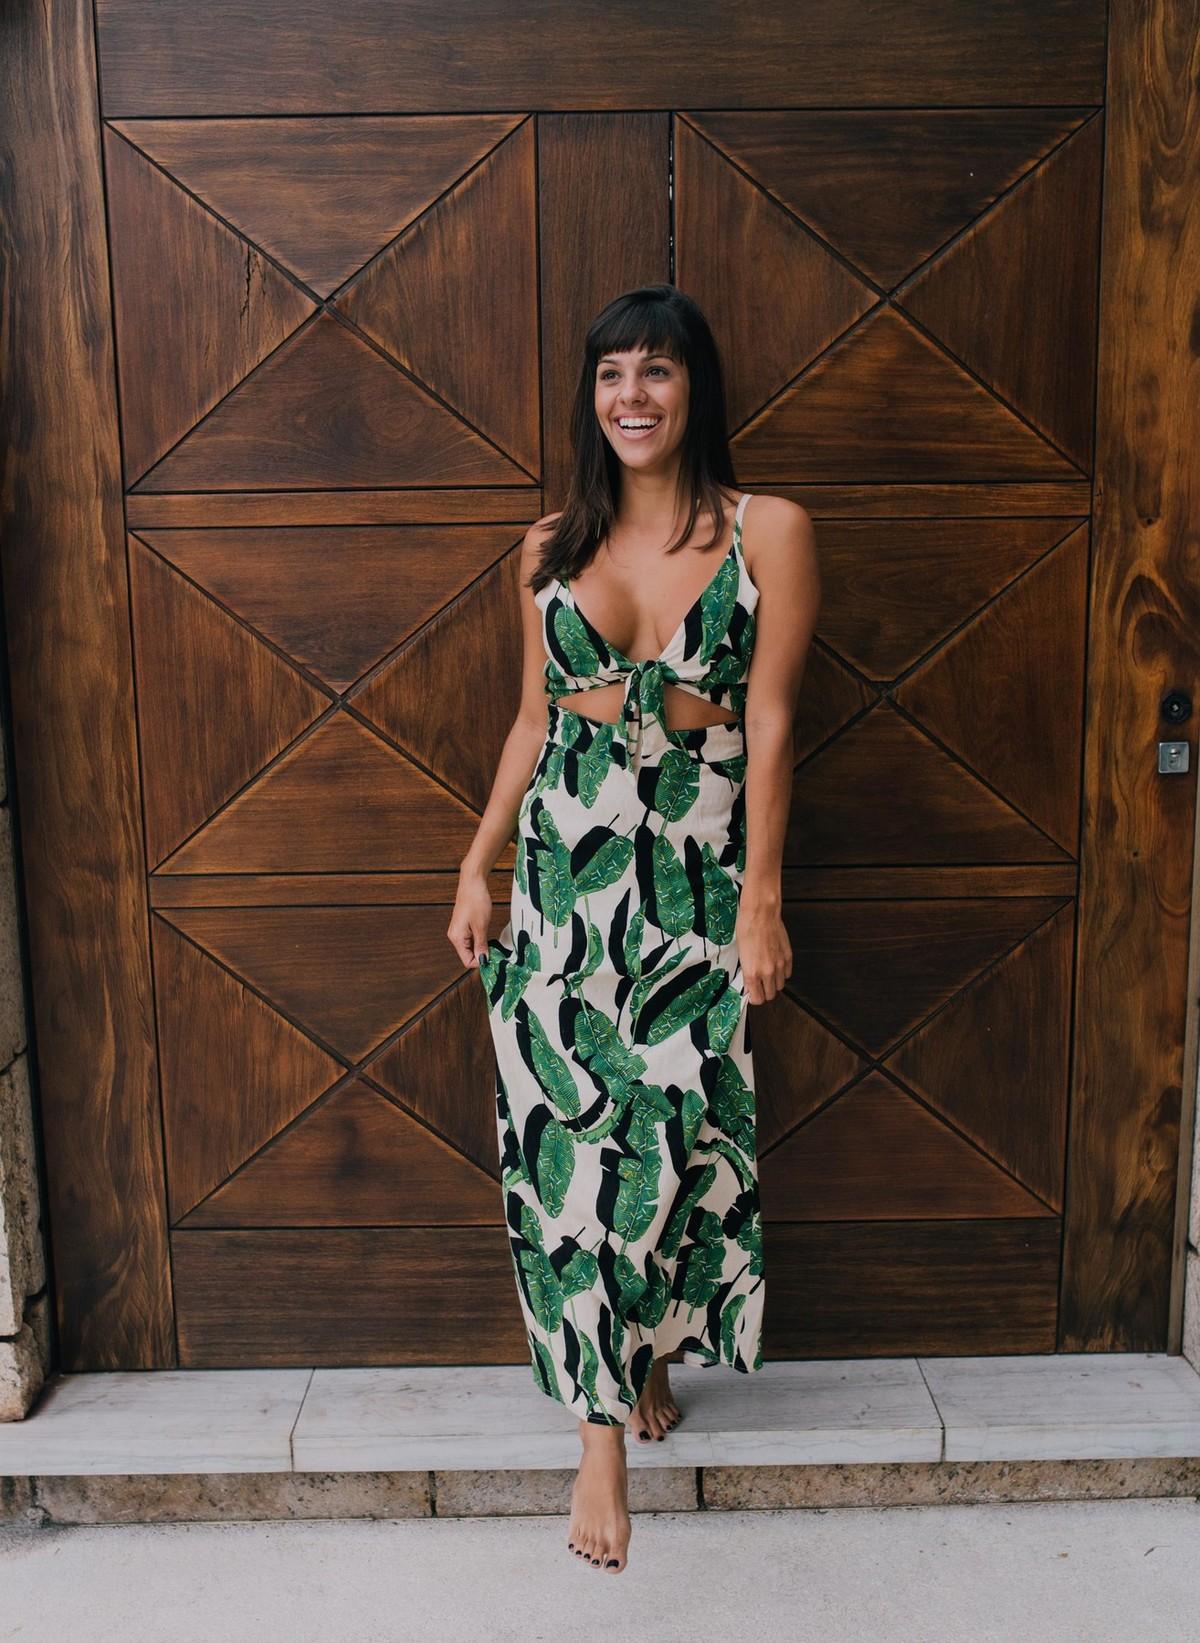 Moda vitoria editoral fashion capixaba fotos ensaio cute style estilo moda feminina look dia beauty fashionblog girls trend make-up hair agua salgada mar praia ilha frade